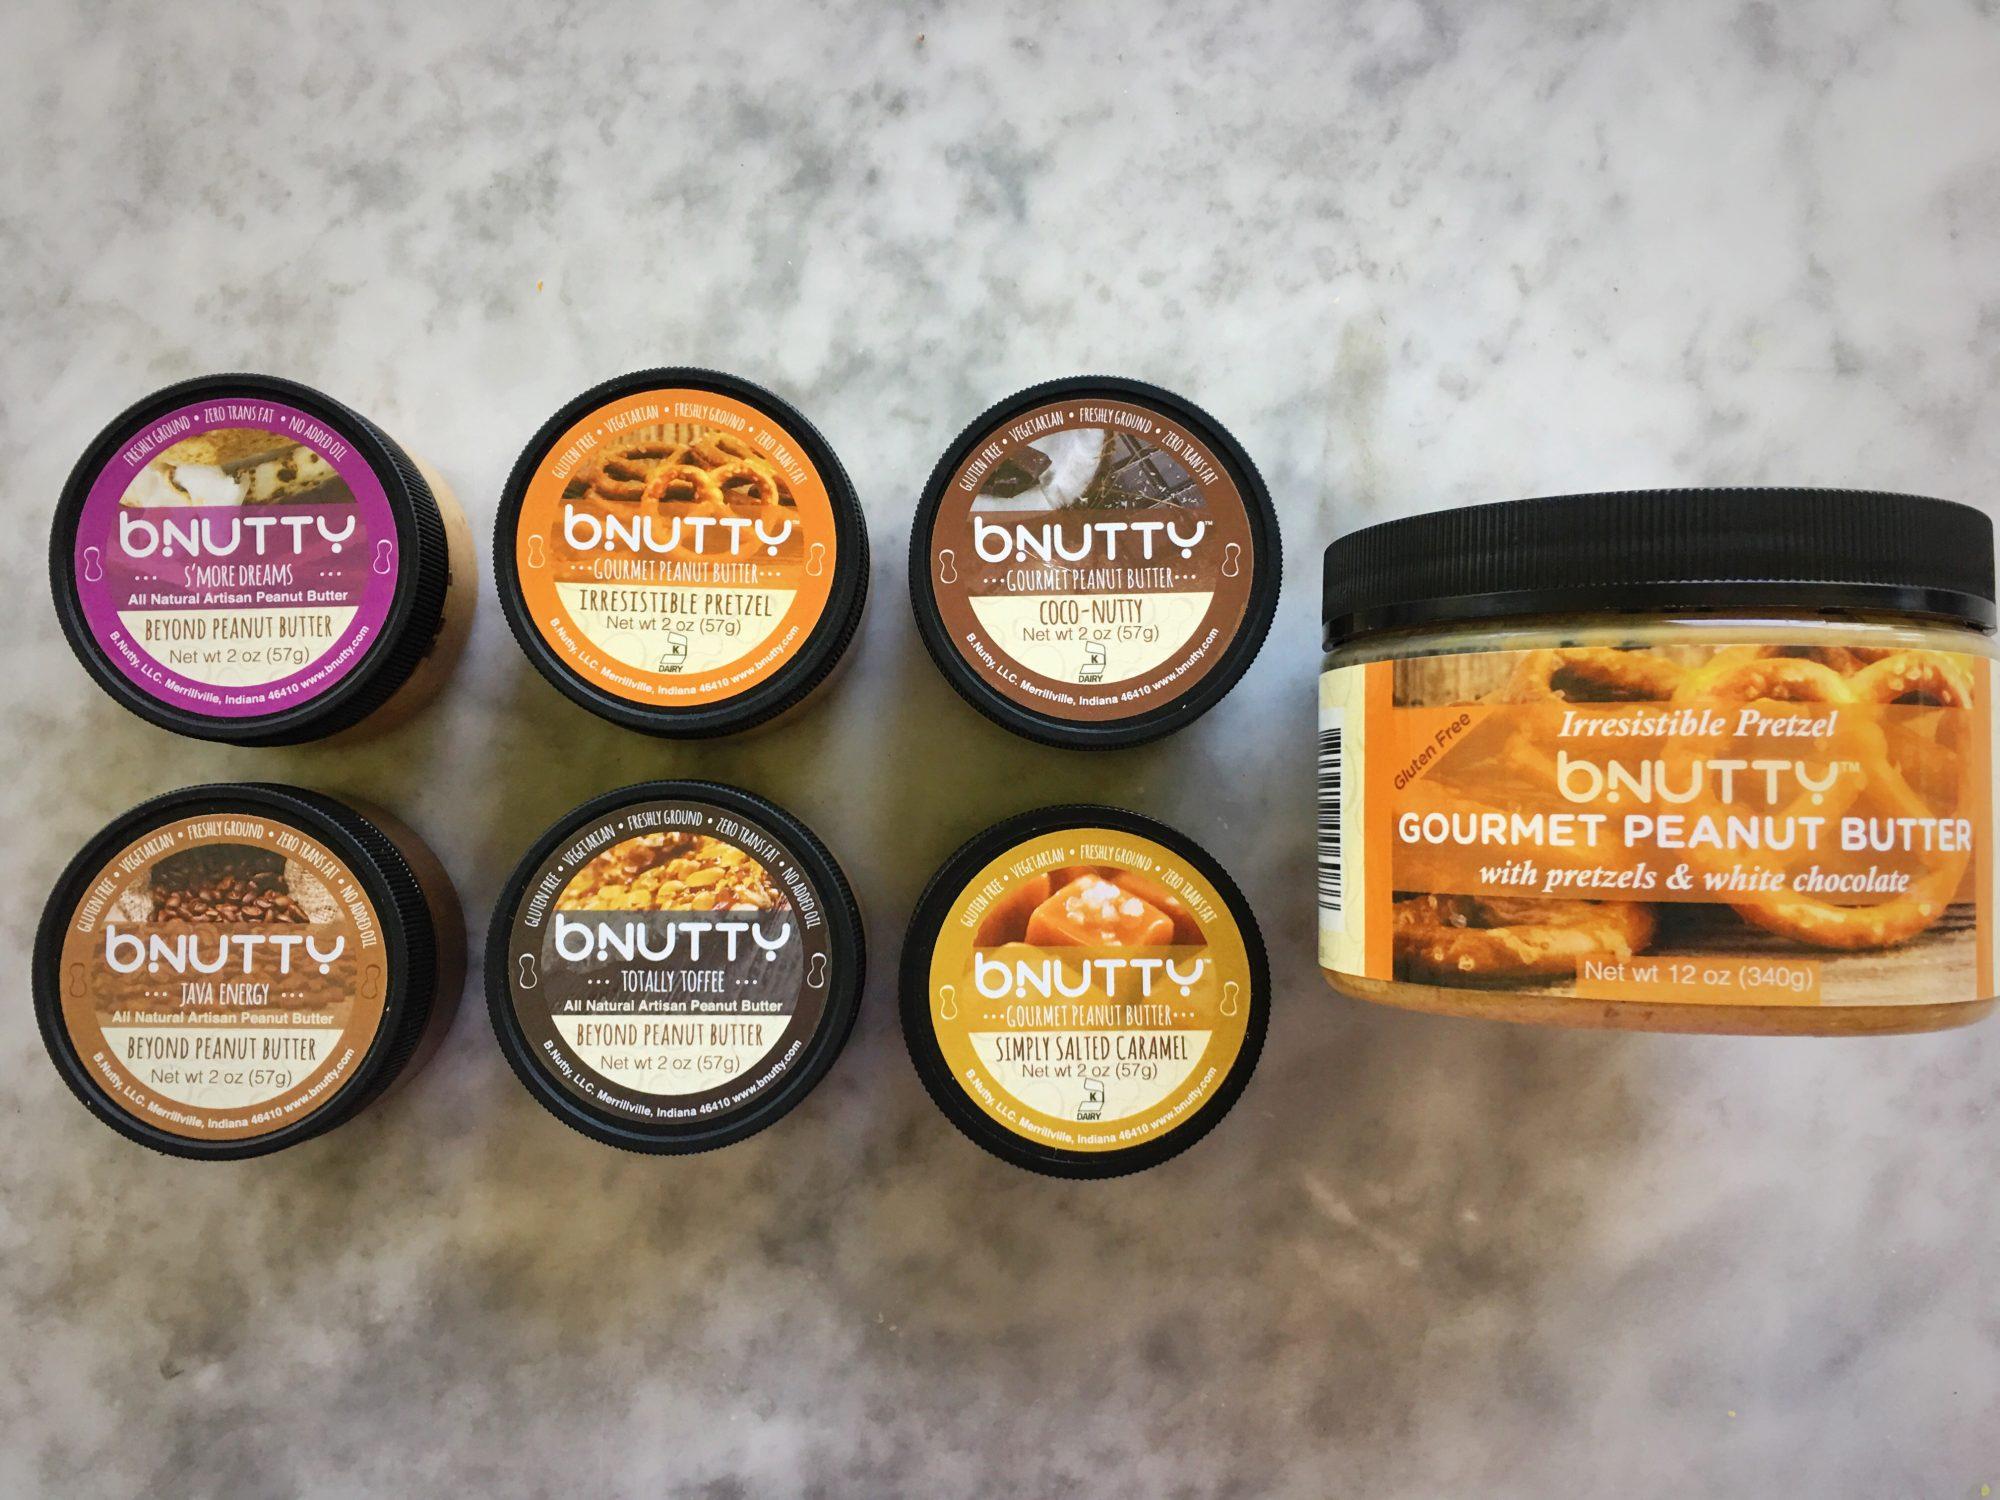 Bnutty Peanut Butter